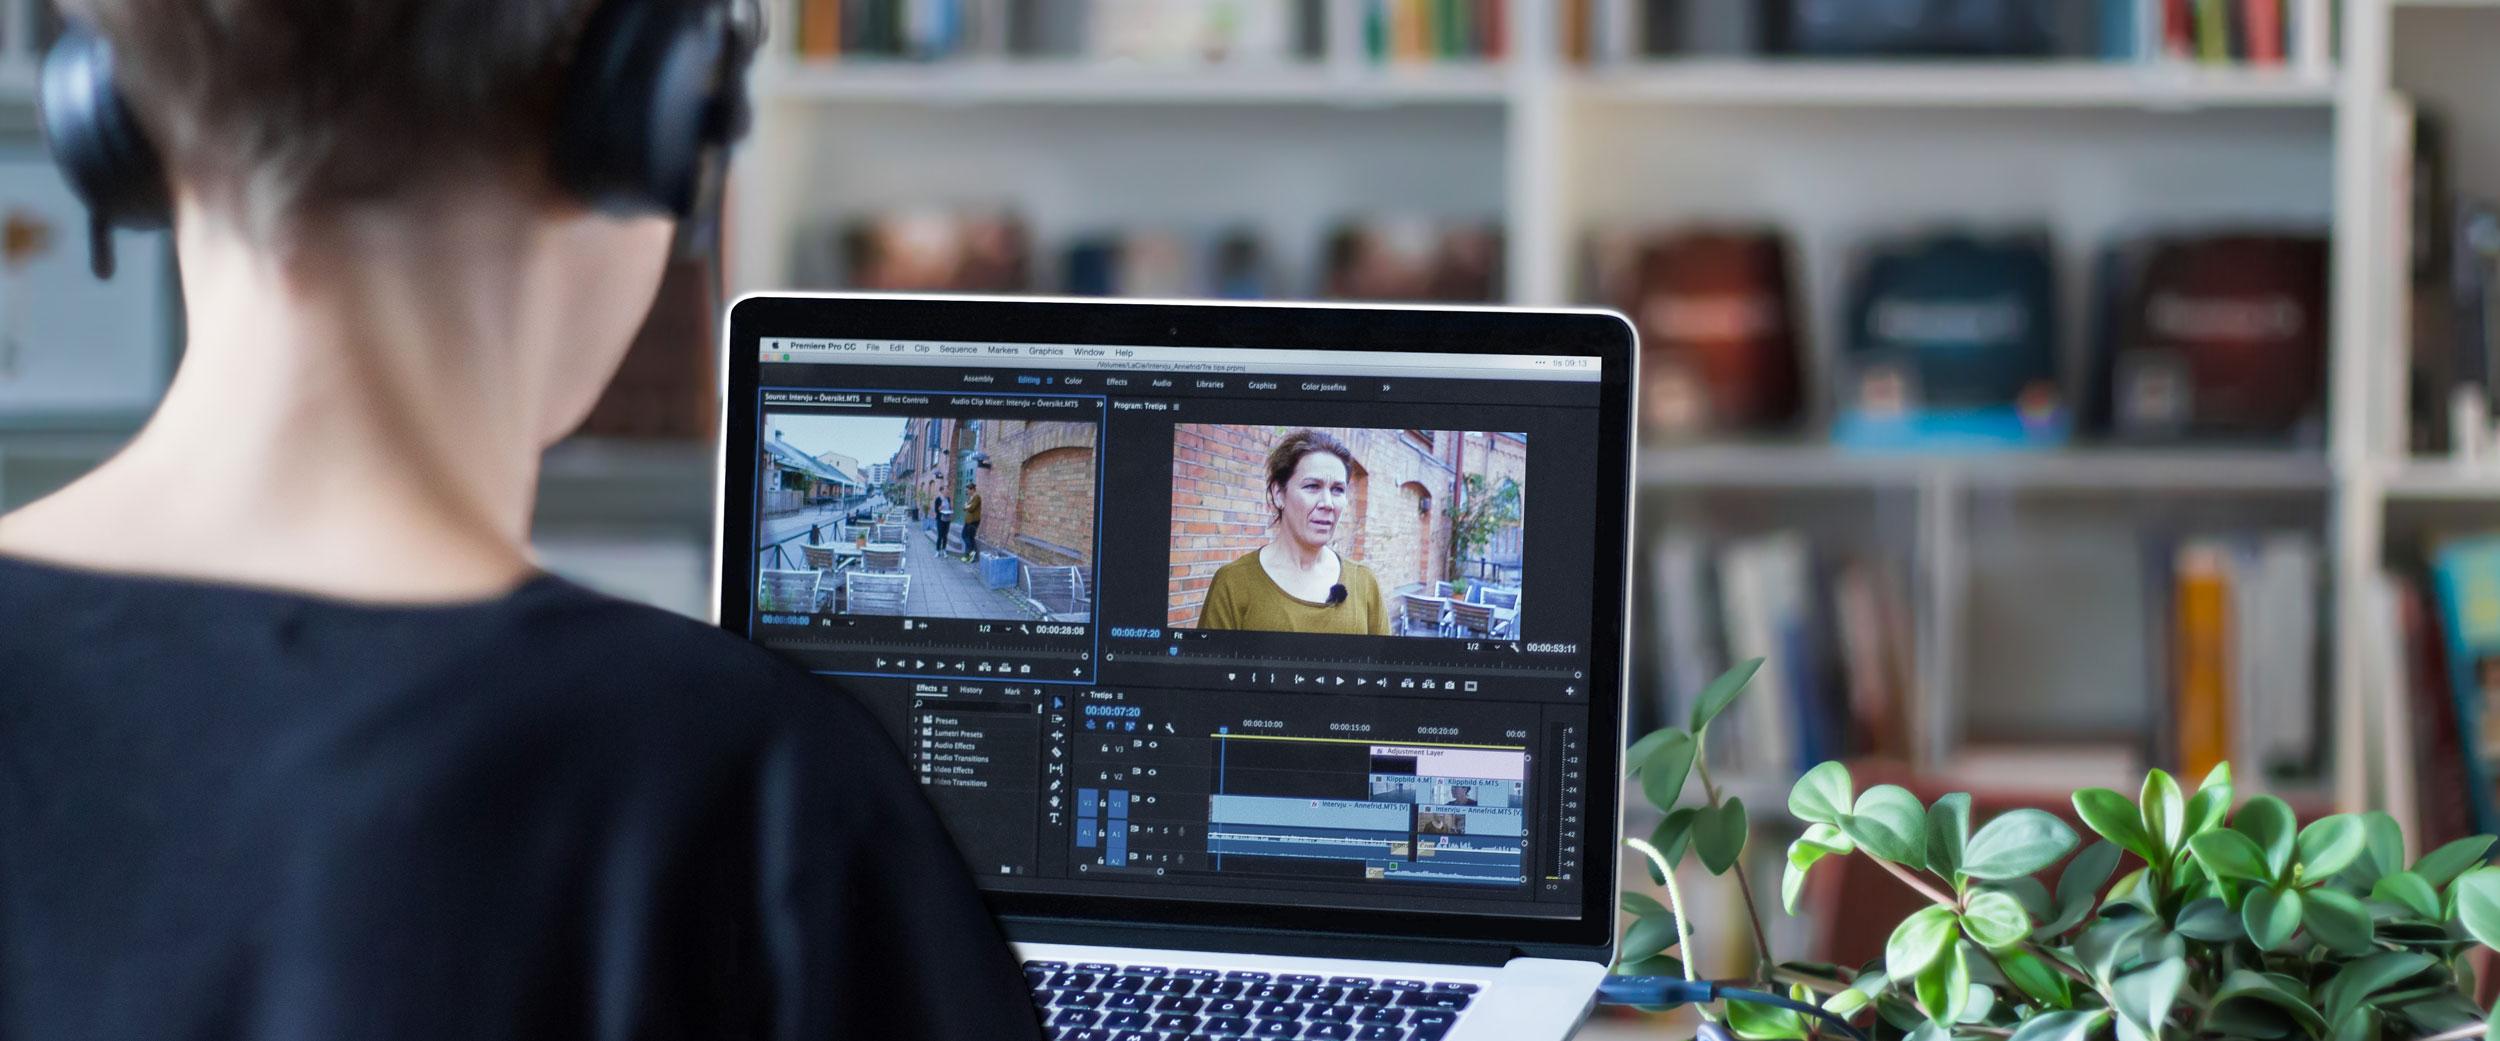 Onlinekurs Videoredigera med Premiere Pro